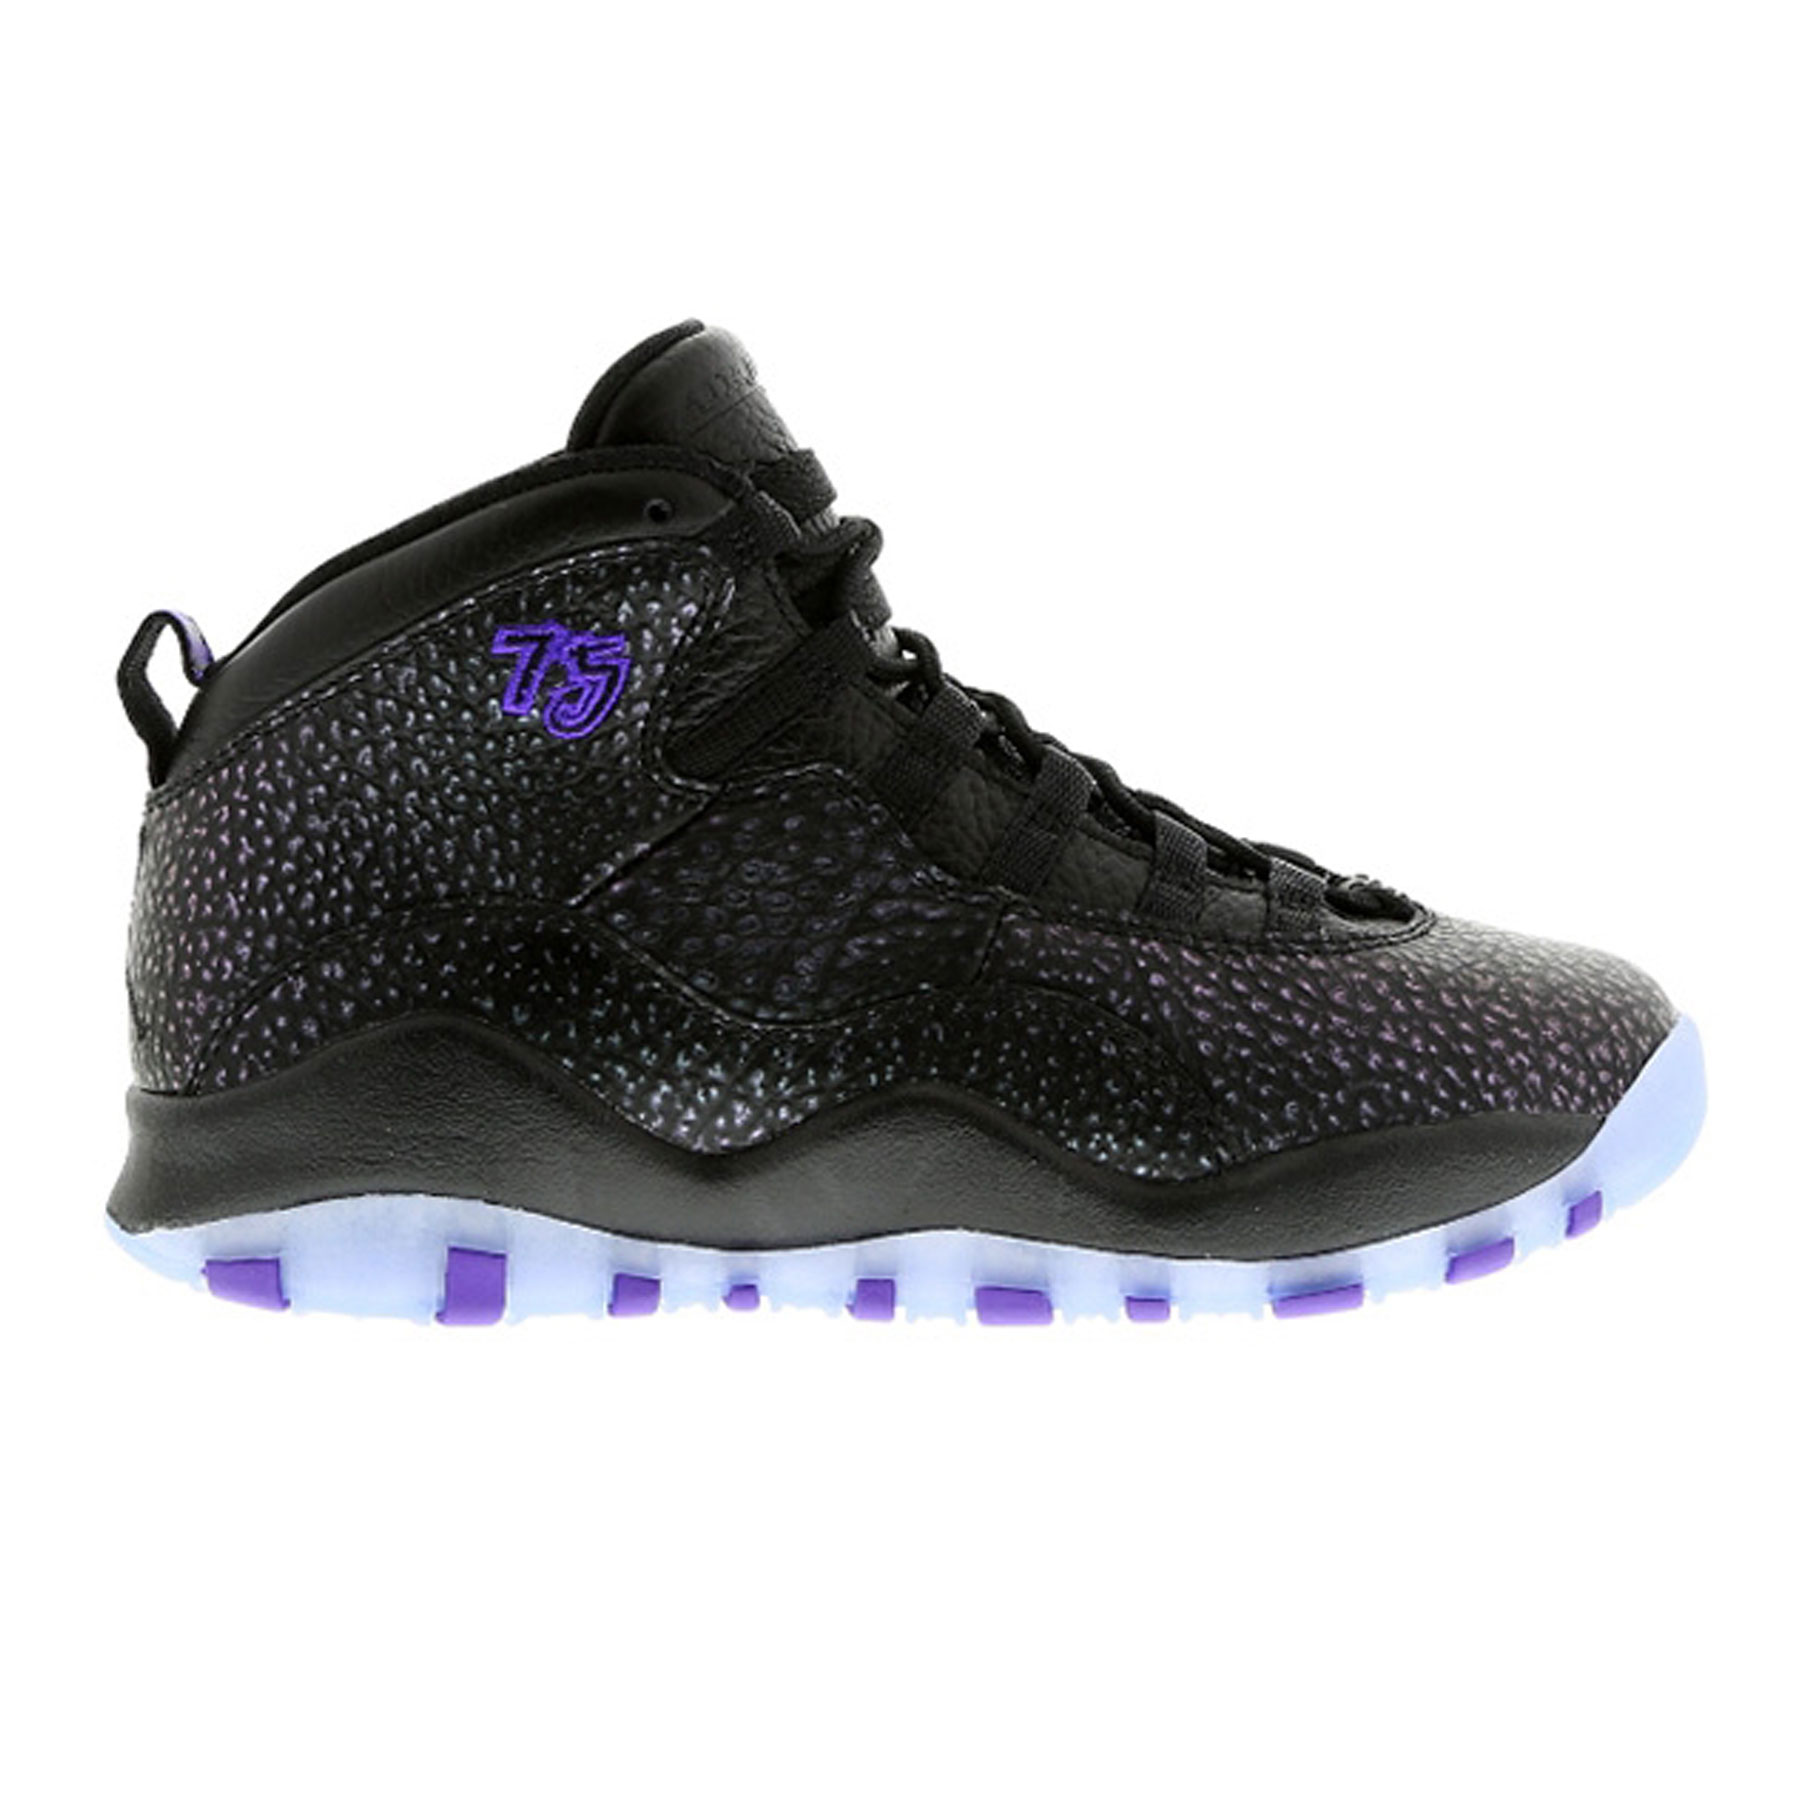 Scarpe Nike Jordan 2016  in anteprima tutti i nuovi modelli per l ... b99c7876601